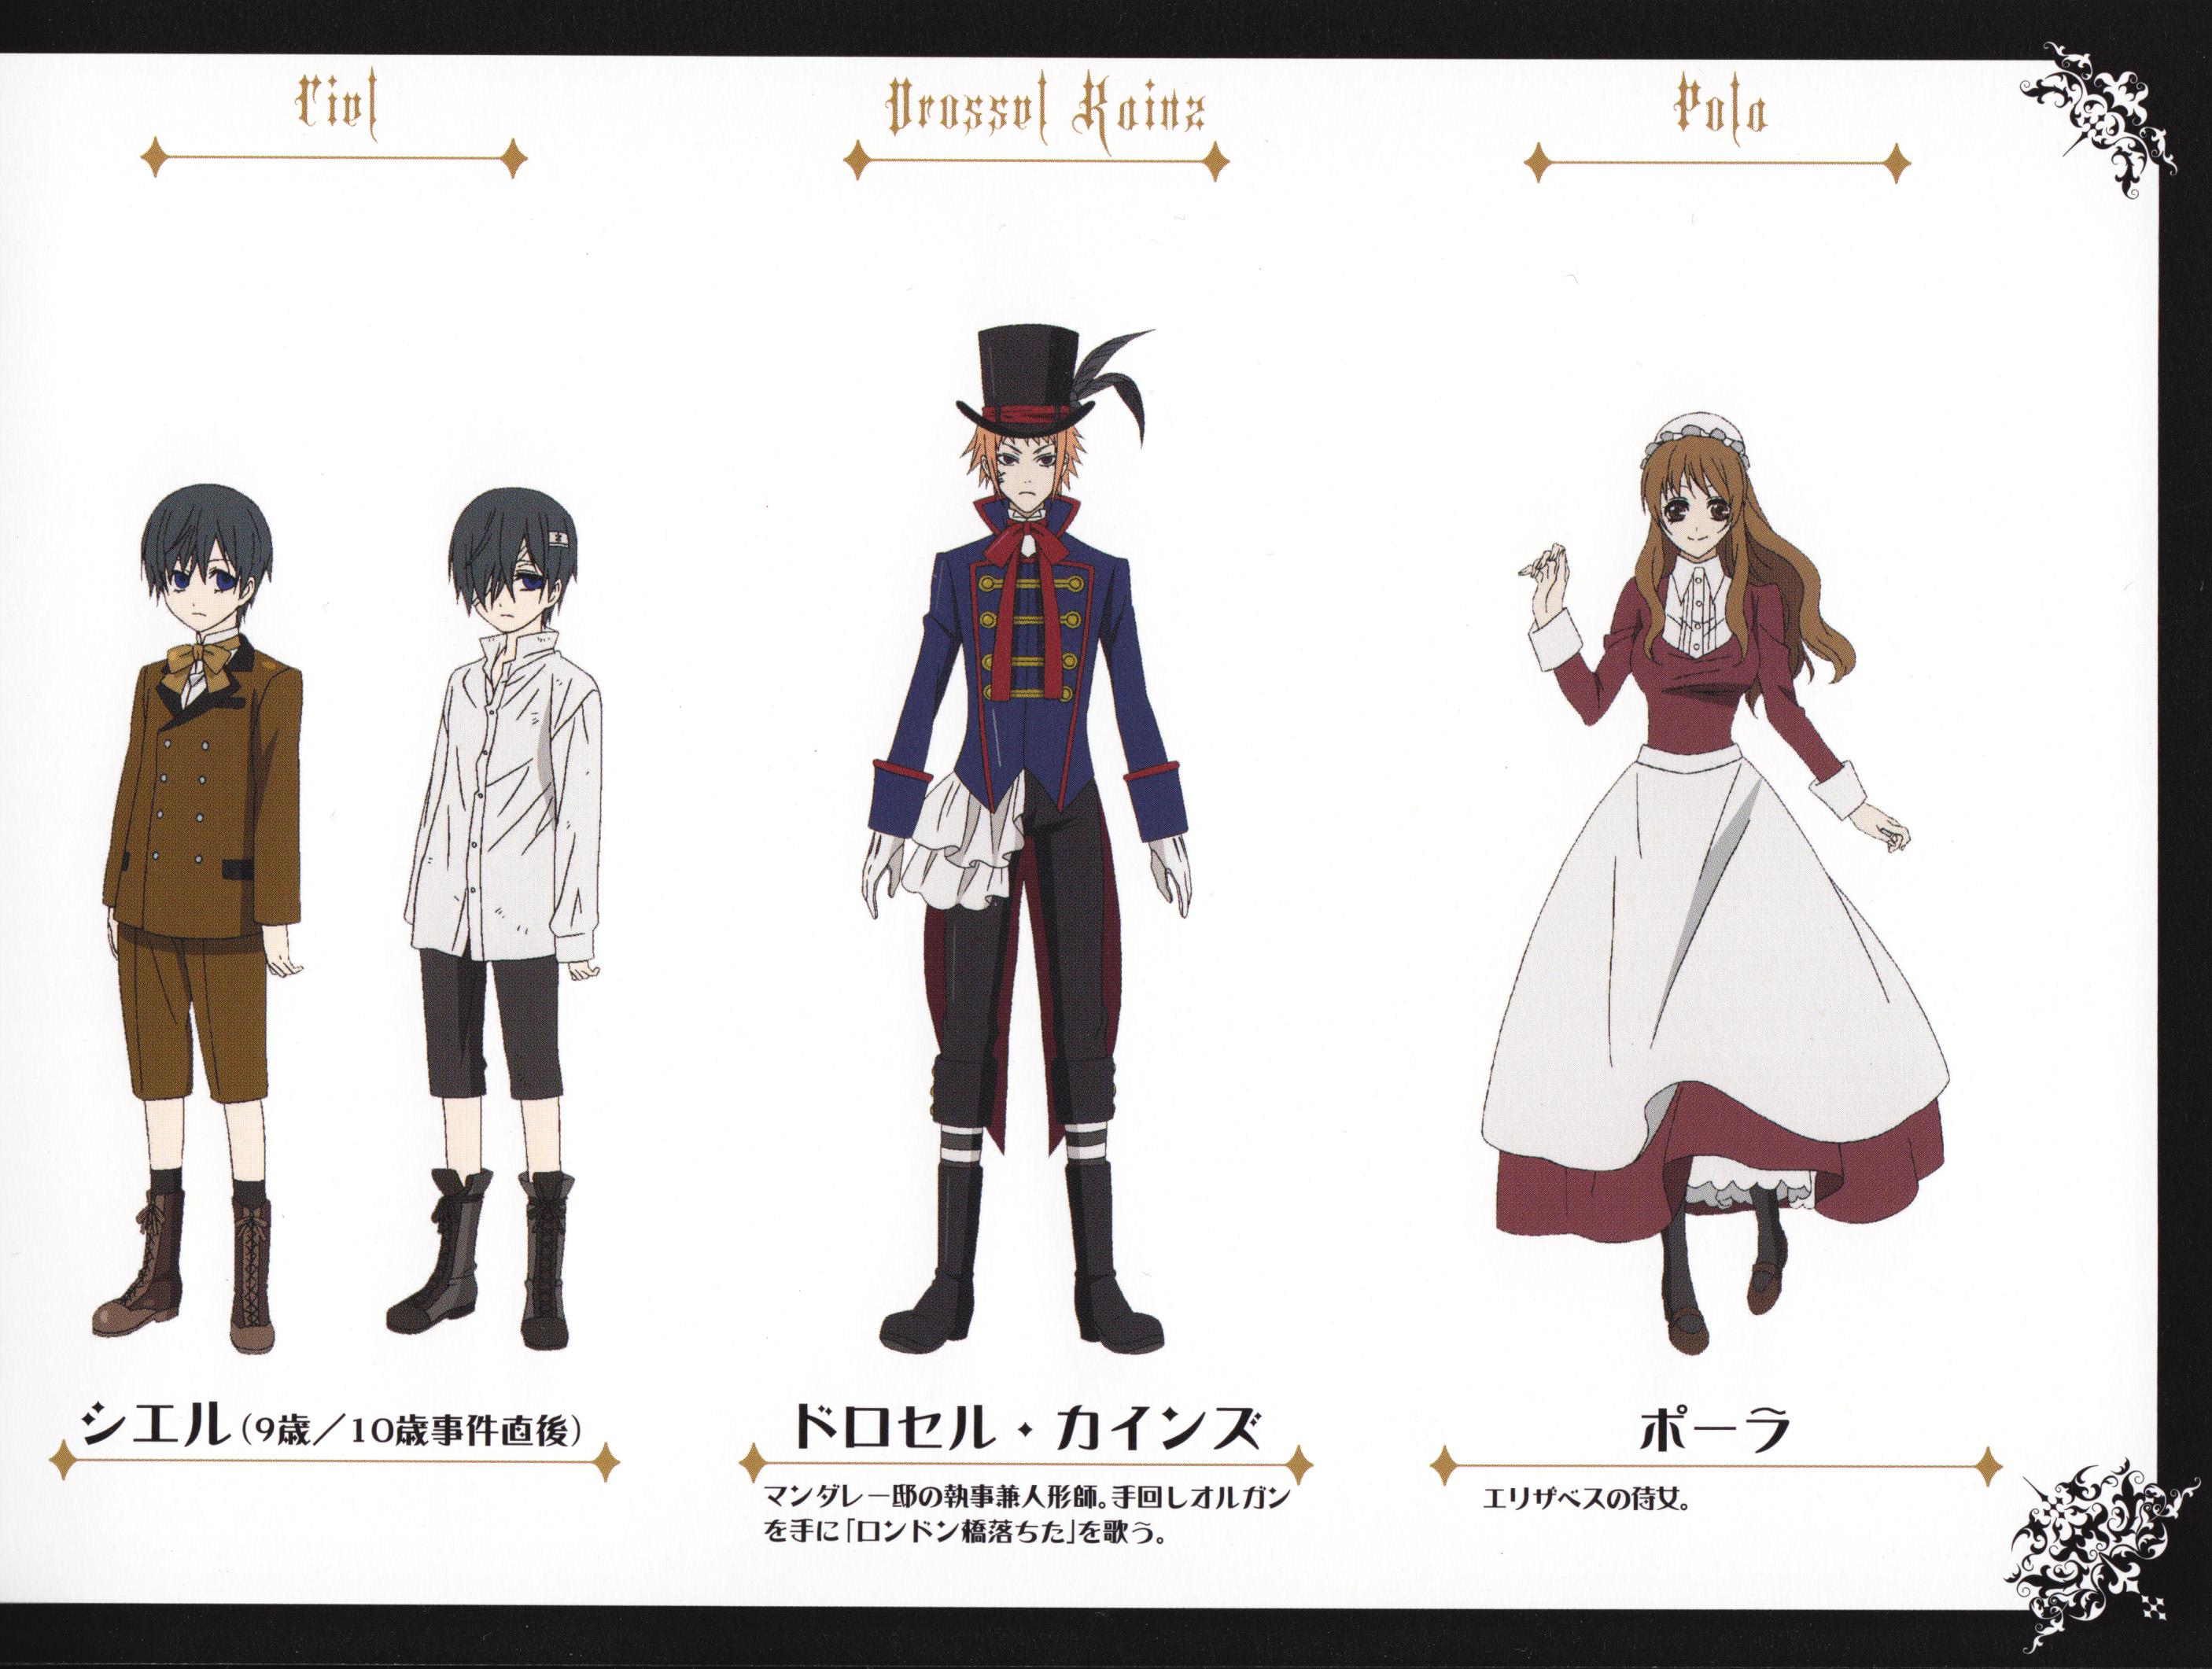 Kuroshitsuji Character Design Book : Kuroshitsuji black butler toboso yana image